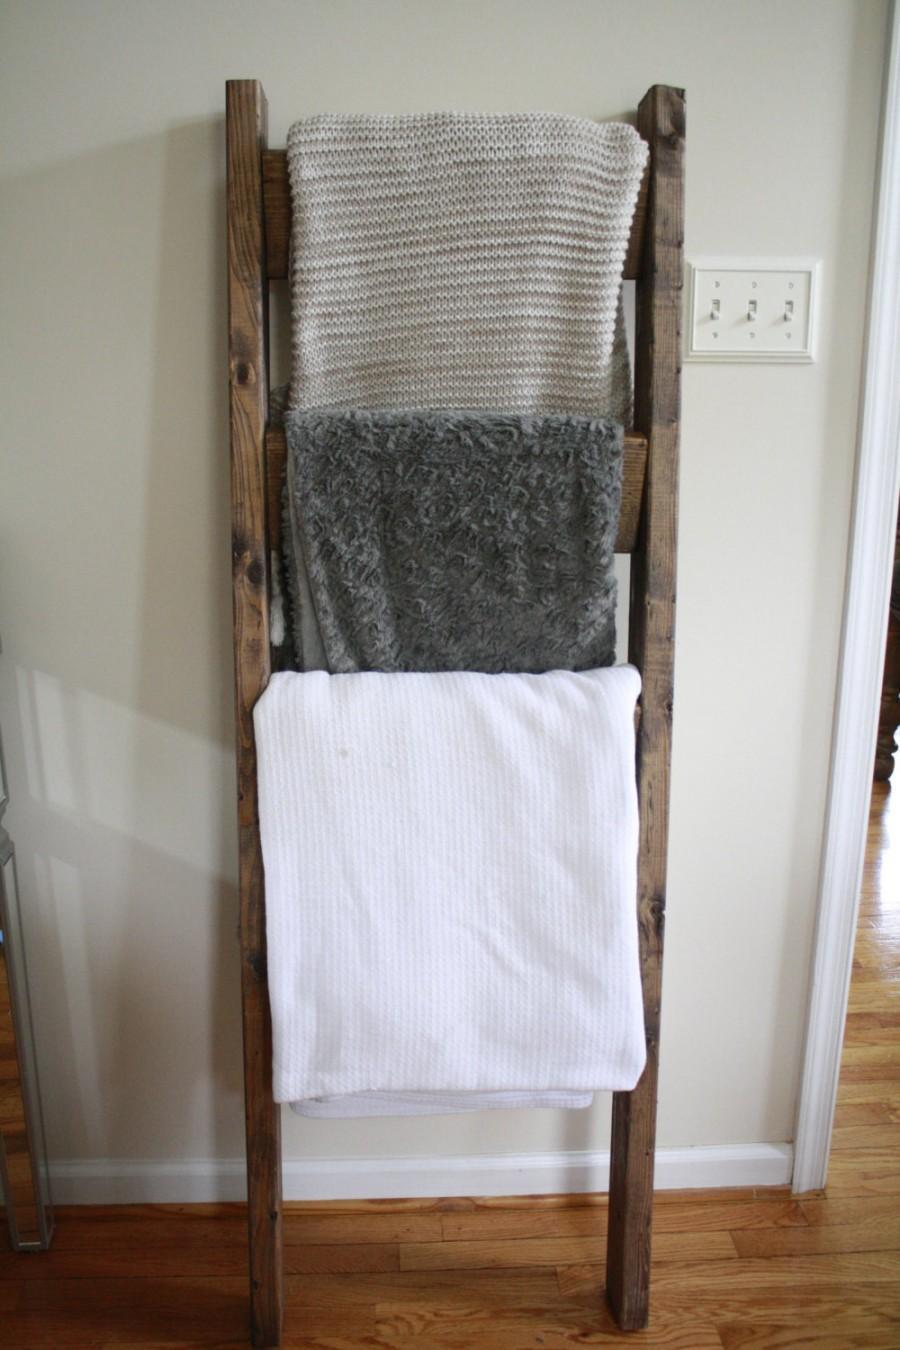 زفاف - Blanket Ladder, Towel Ladder, Decorative Ladder